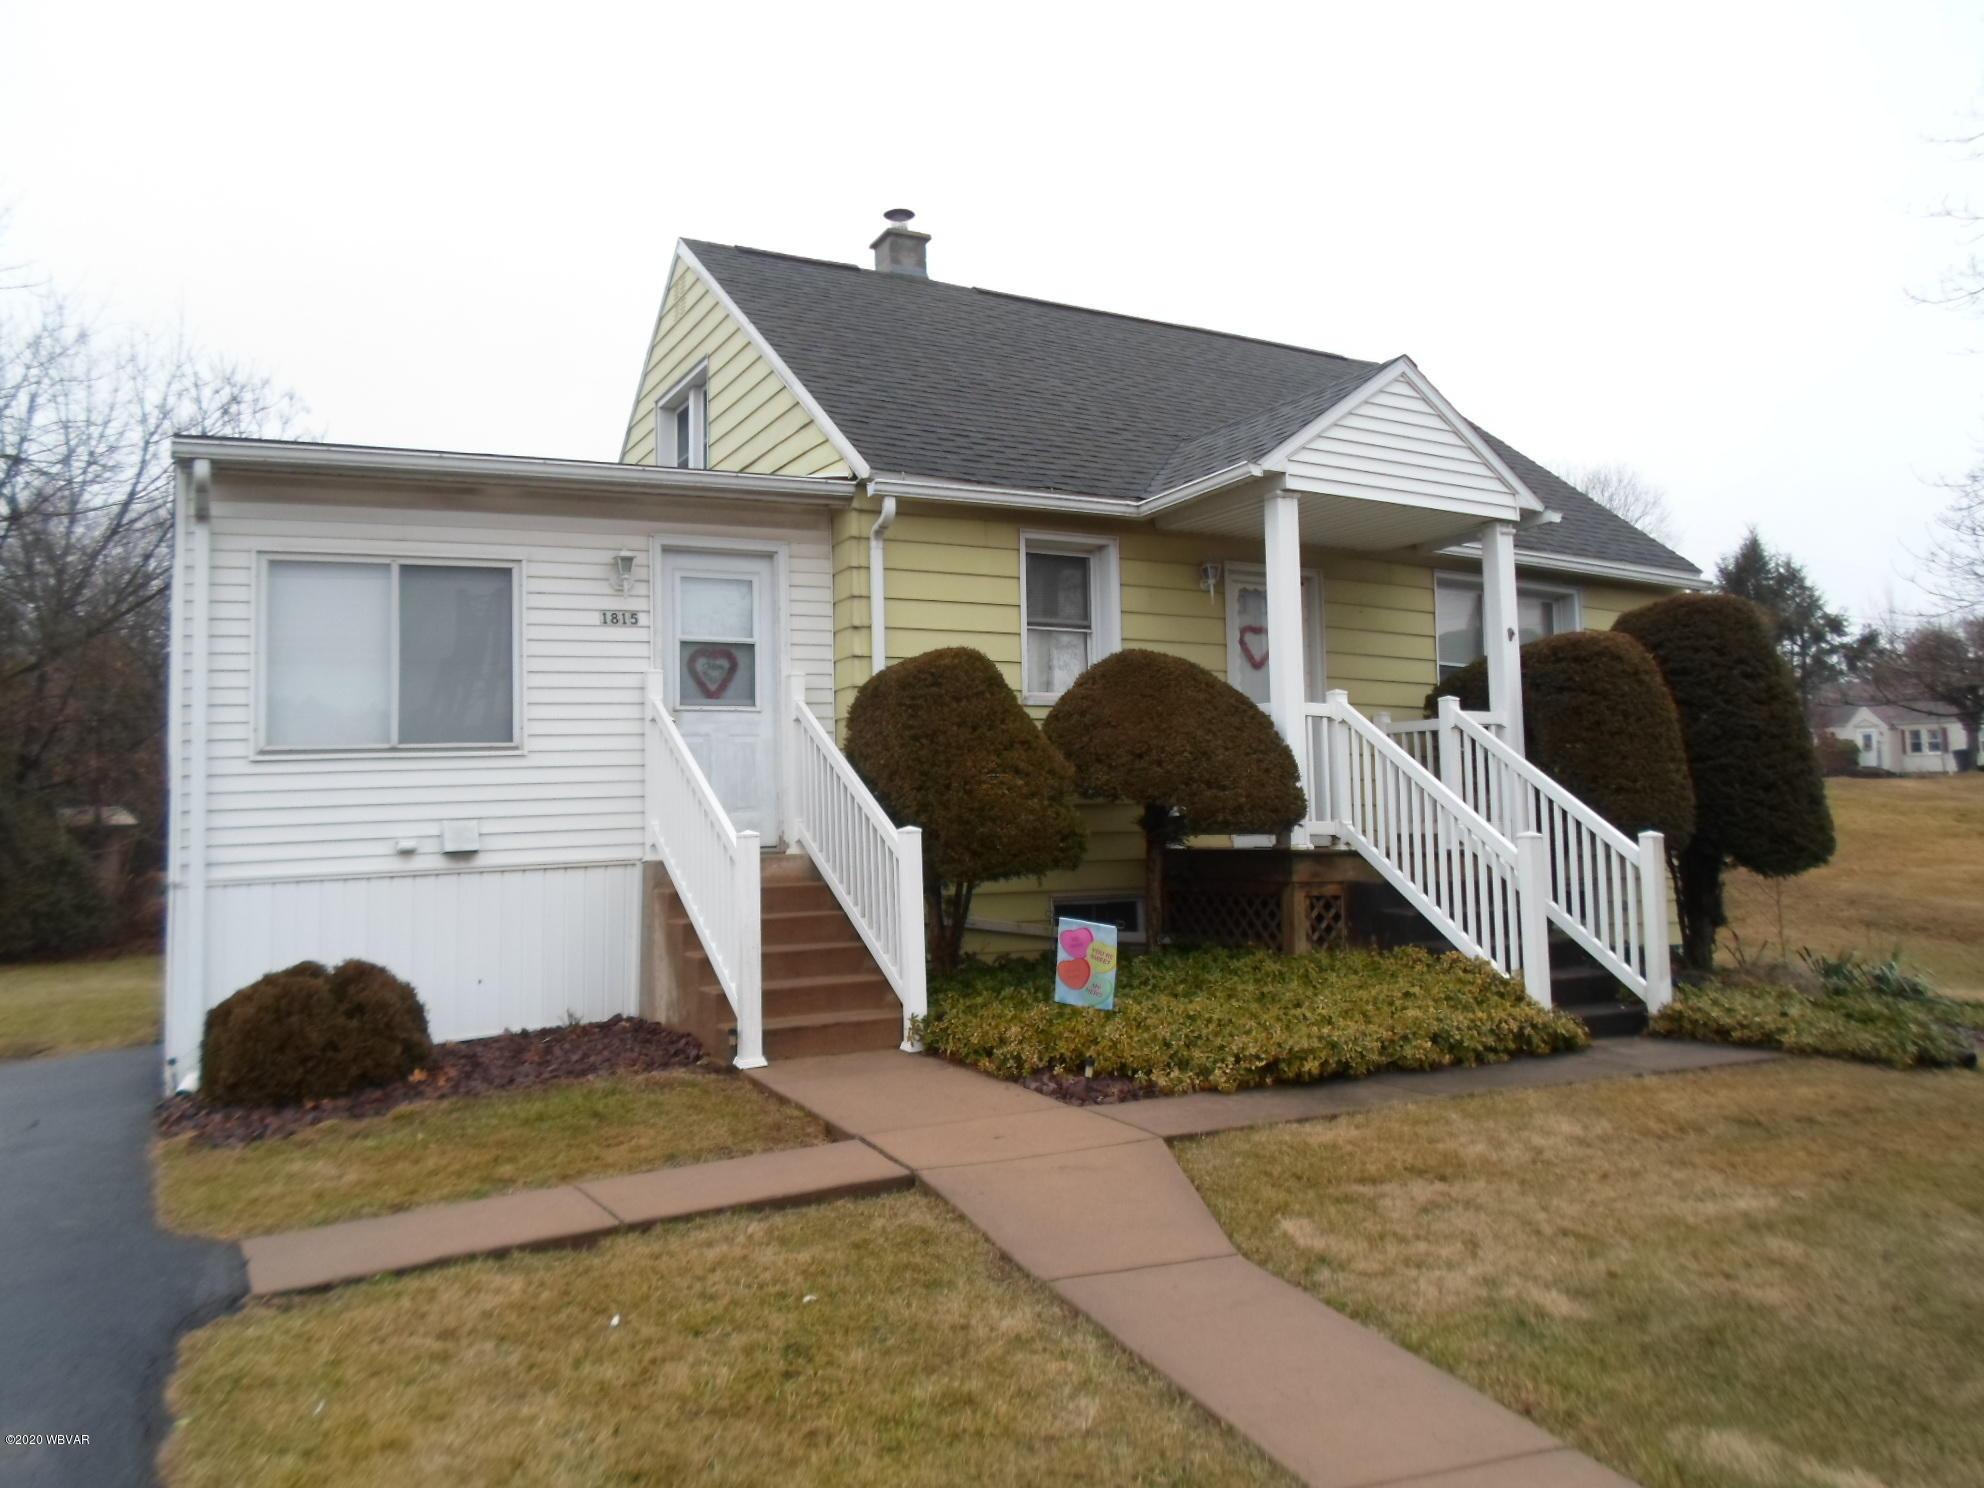 1815 DEWEY AVENUE, Williamsport, PA 17701, 3 Bedrooms Bedrooms, ,1 BathroomBathrooms,Residential,For sale,DEWEY,WB-89536